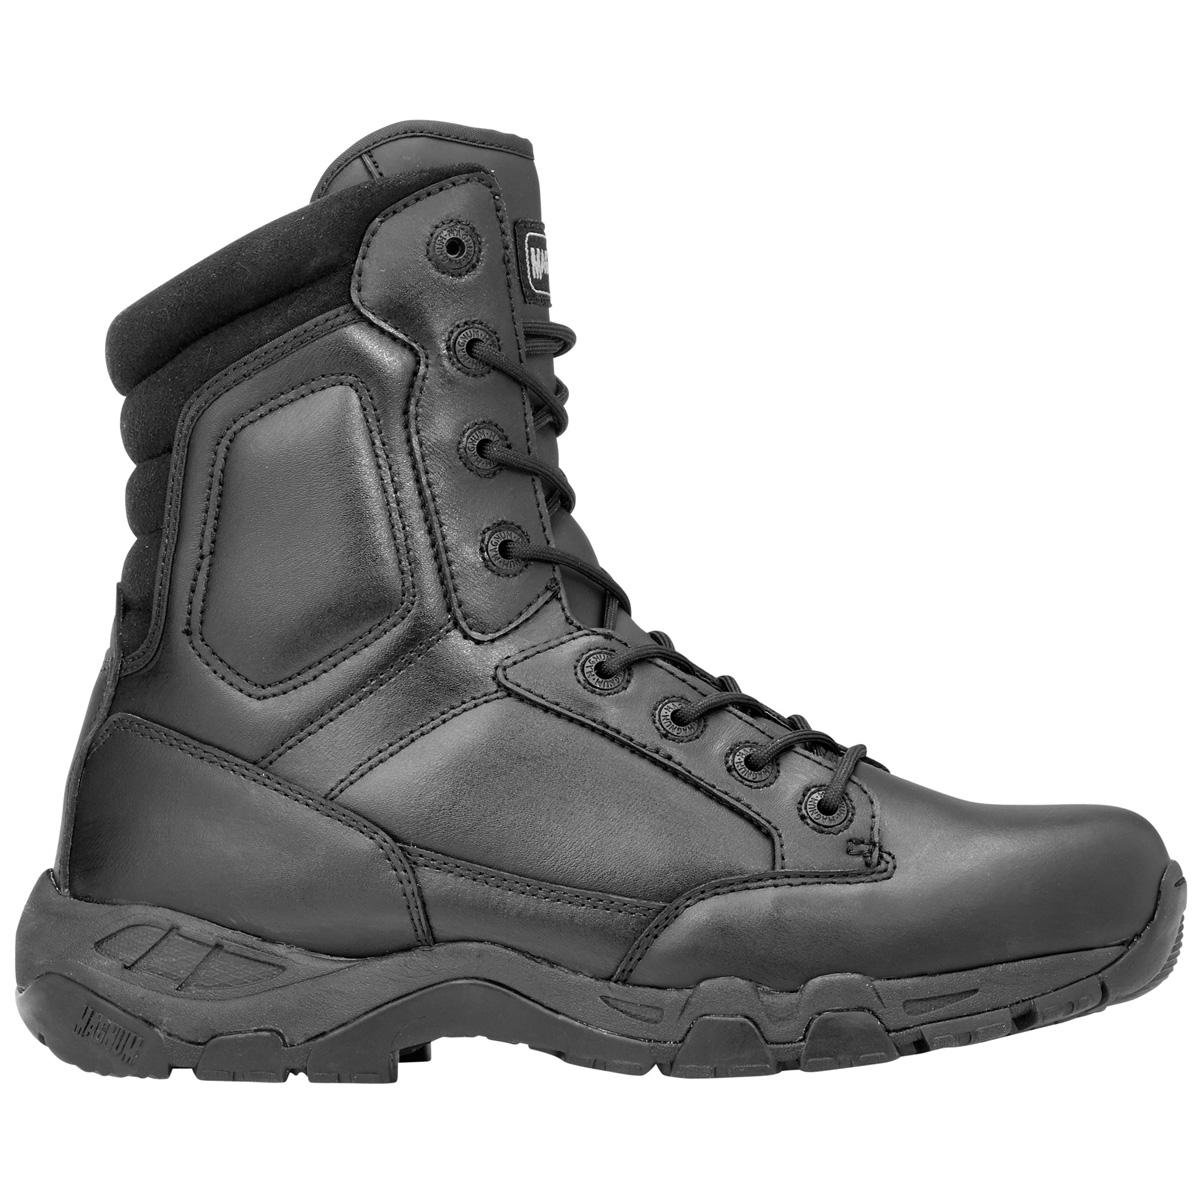 magnum viper pro 8 0 leather boots black